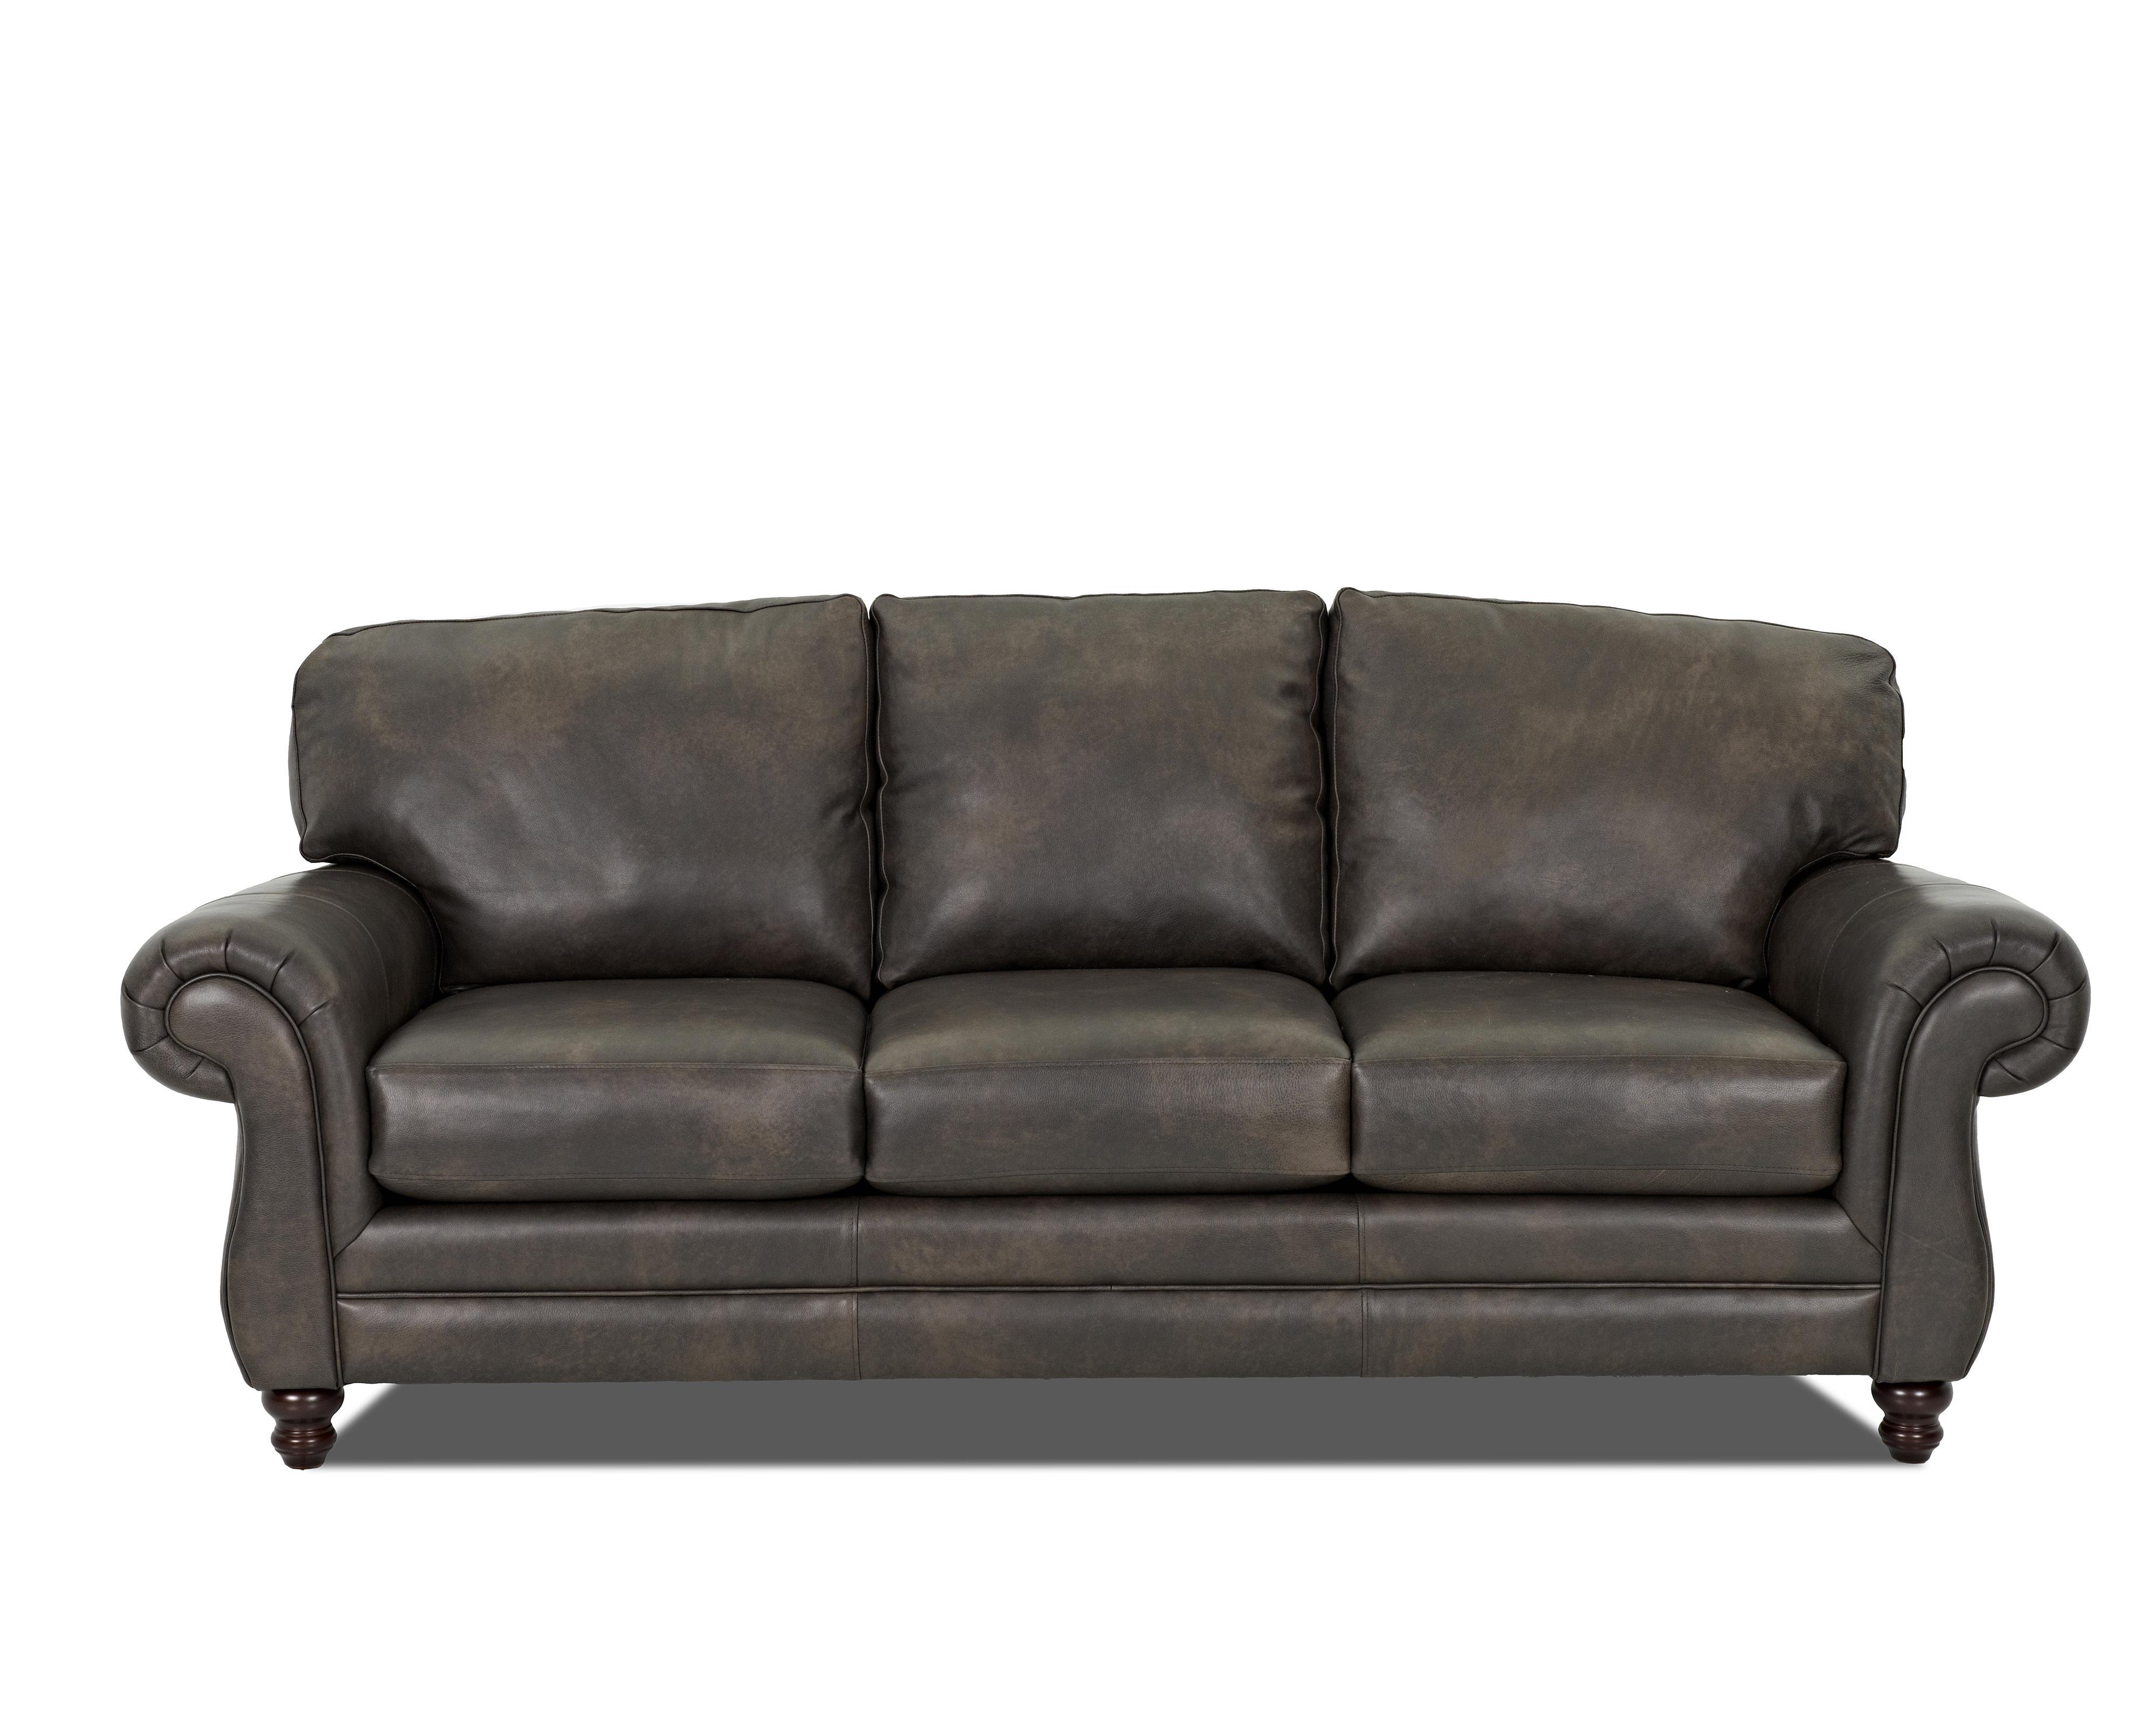 28 klaussner leather sofa klaussner valiant leather sofa wi